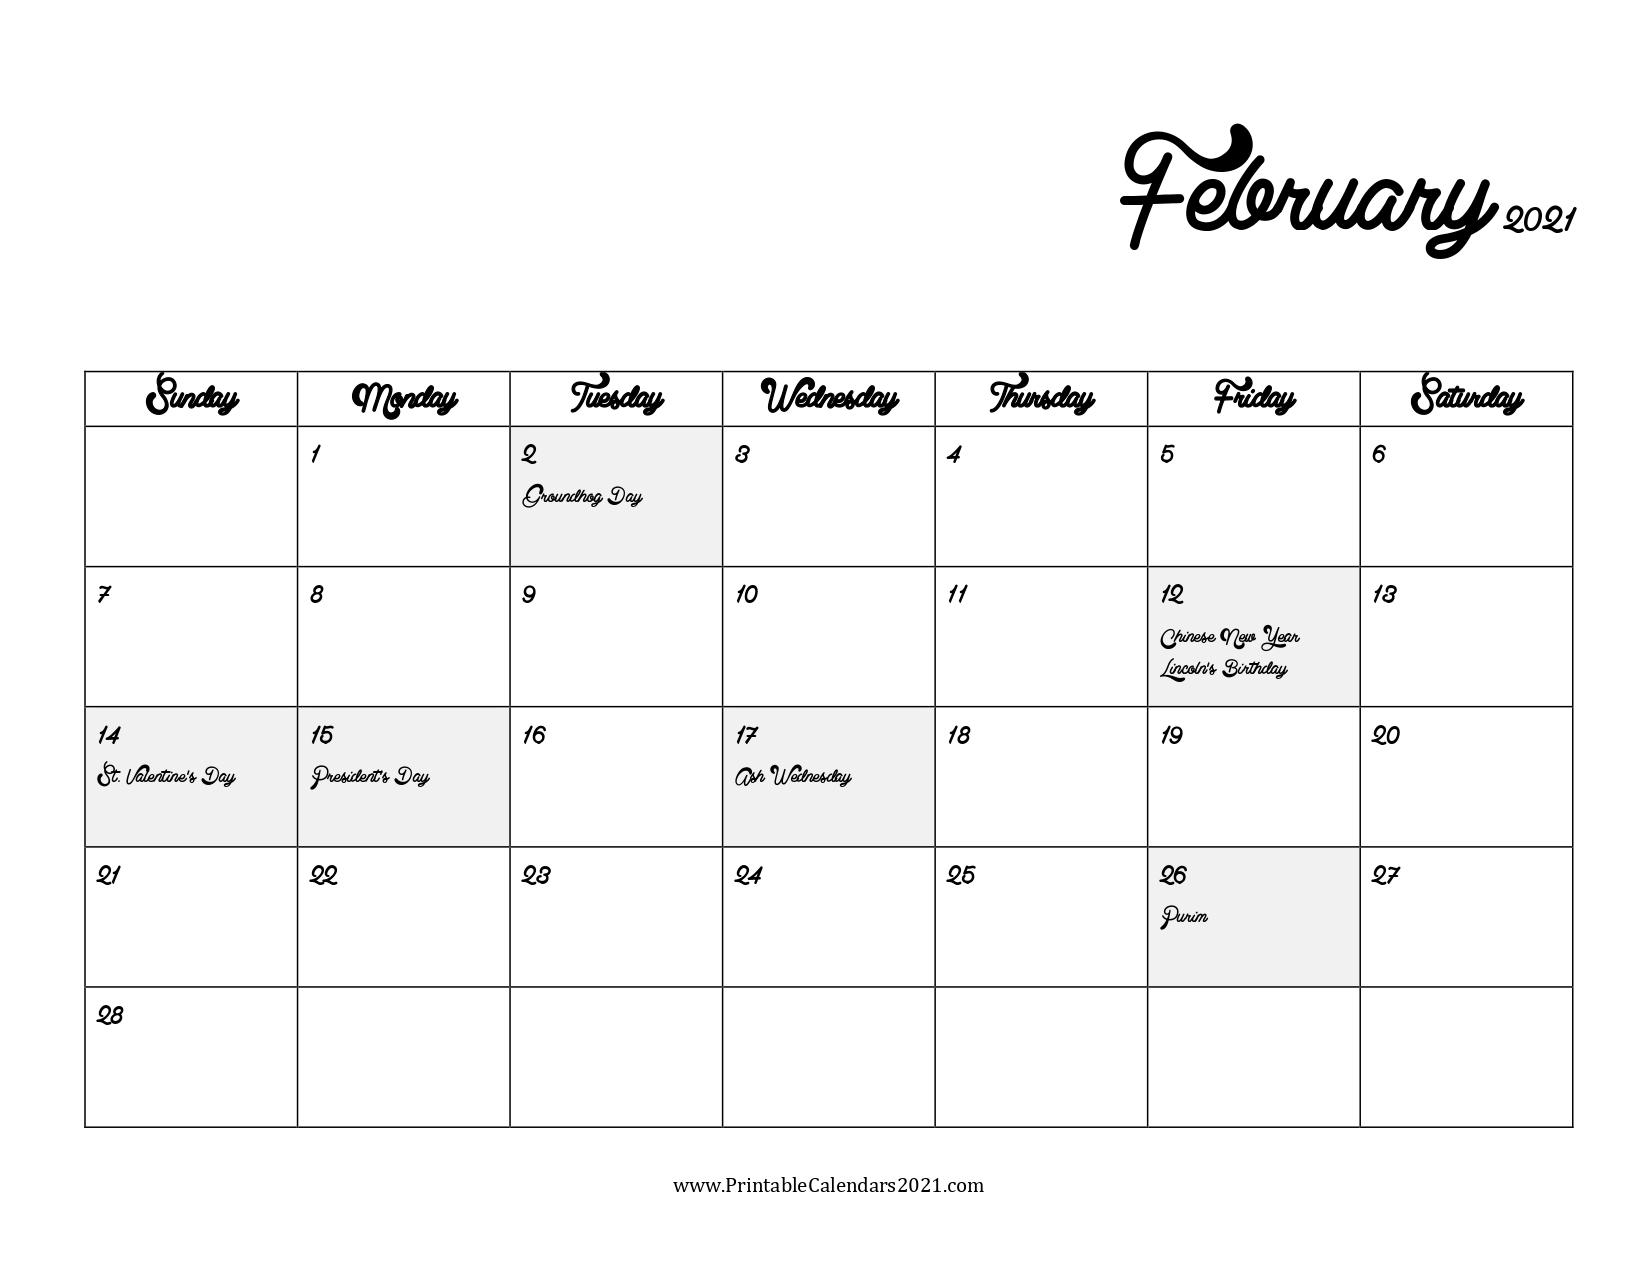 65 Free February 2021 Calendar Printable With Holidays 7